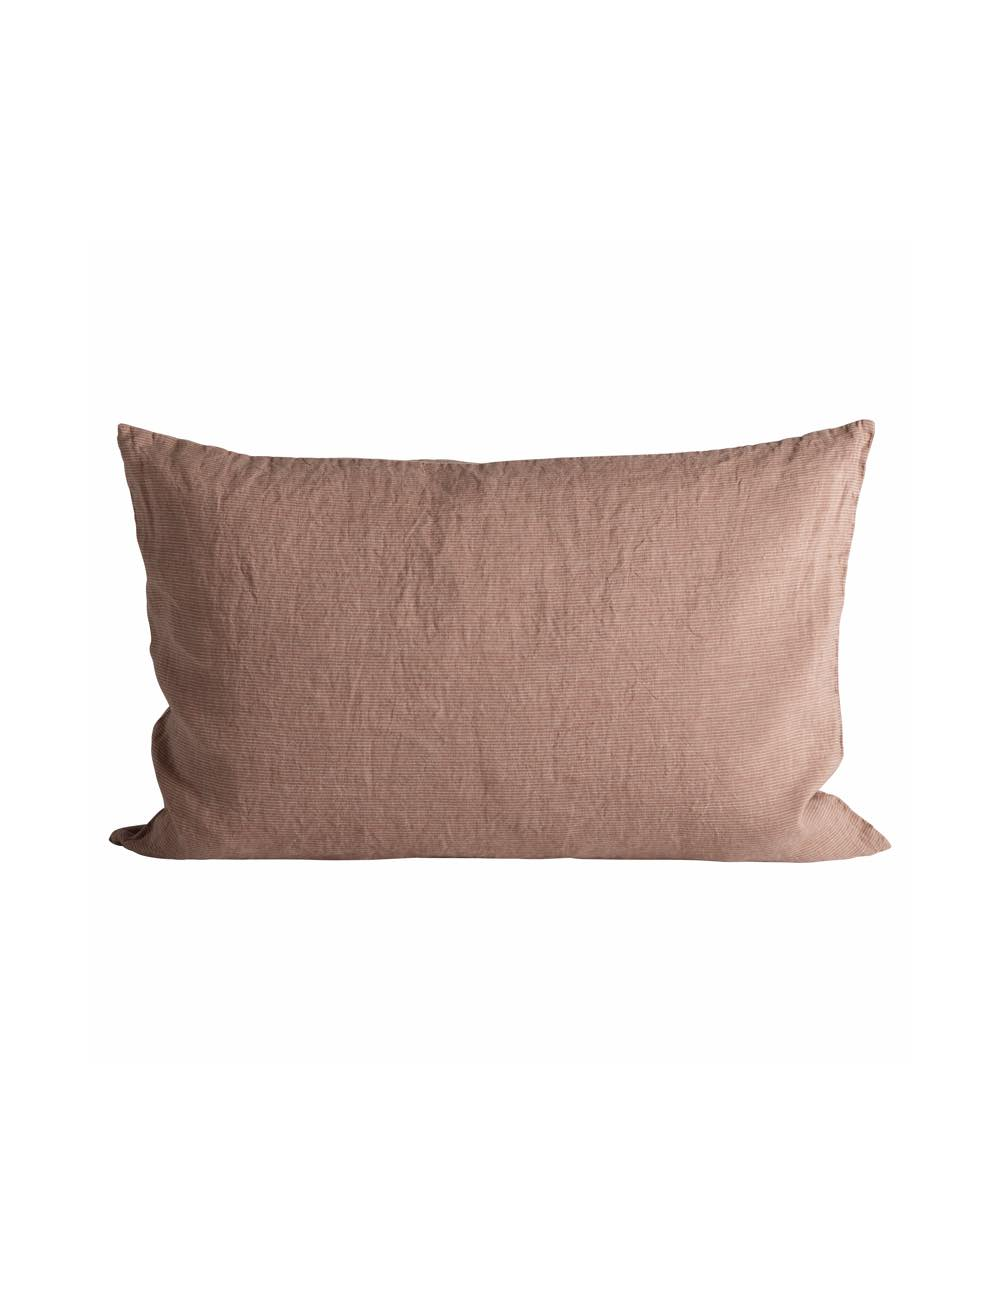 Rose Pin Stripe Cushion cover 50x75cm